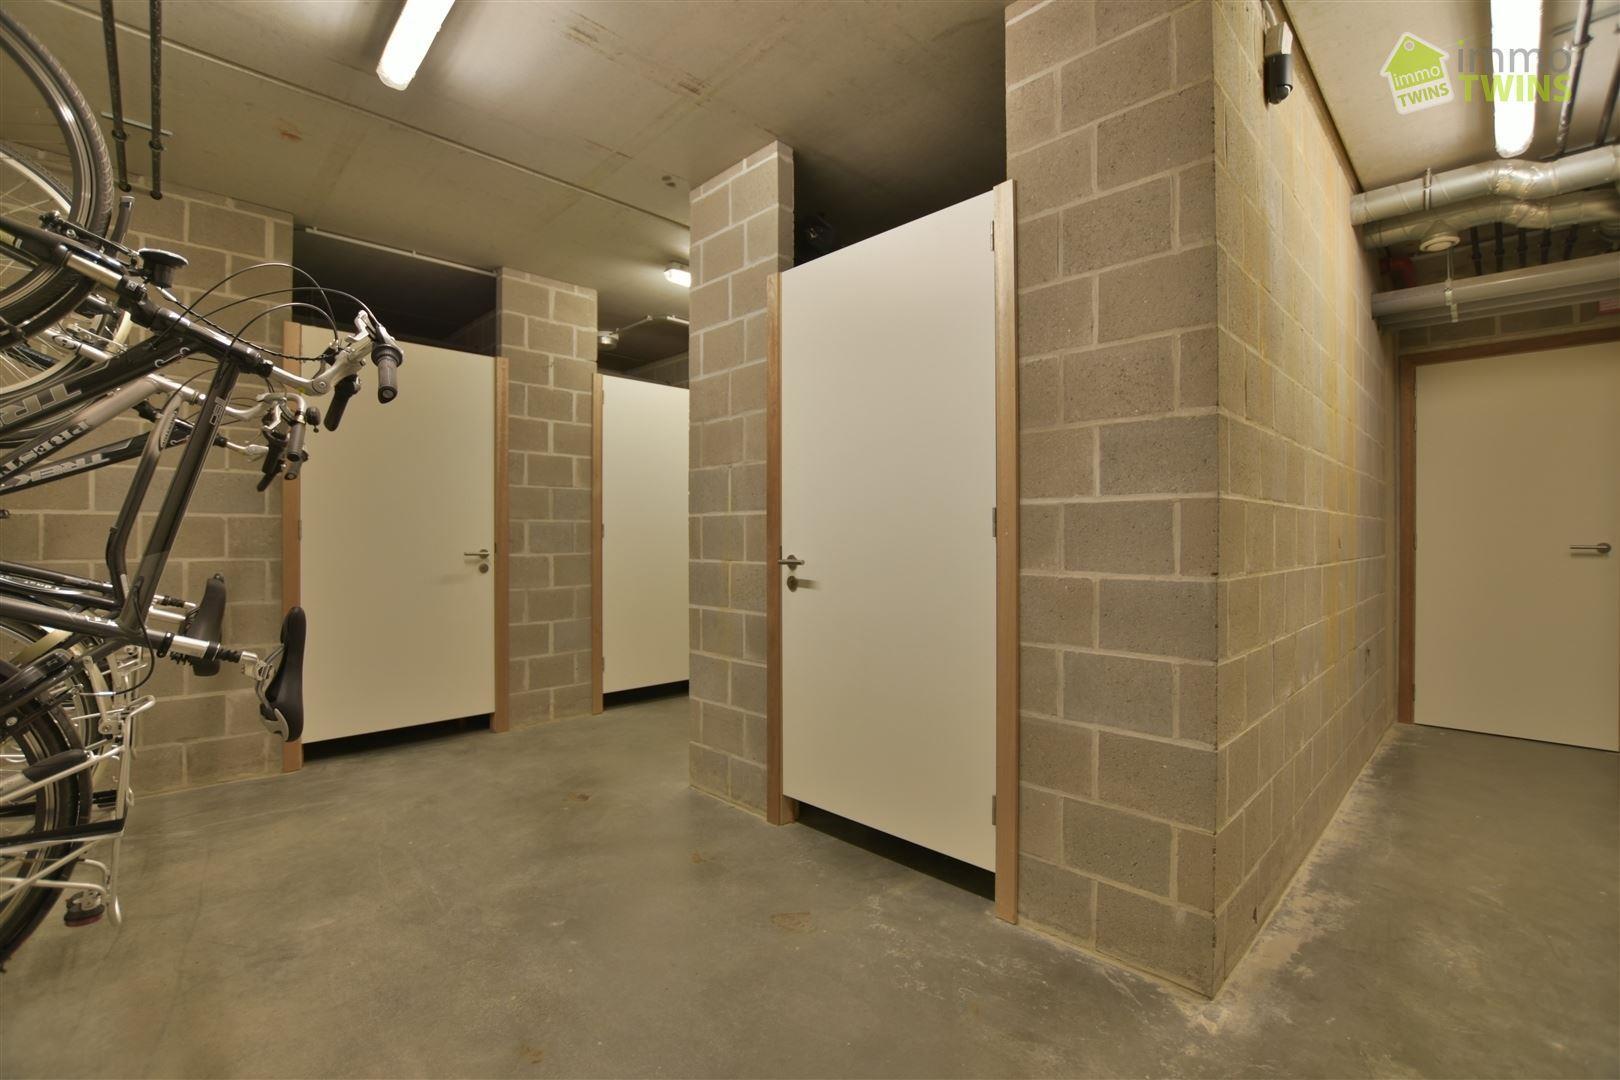 Foto 22 : Appartement te 9200 DENDERMONDE (België) - Prijs € 1.100